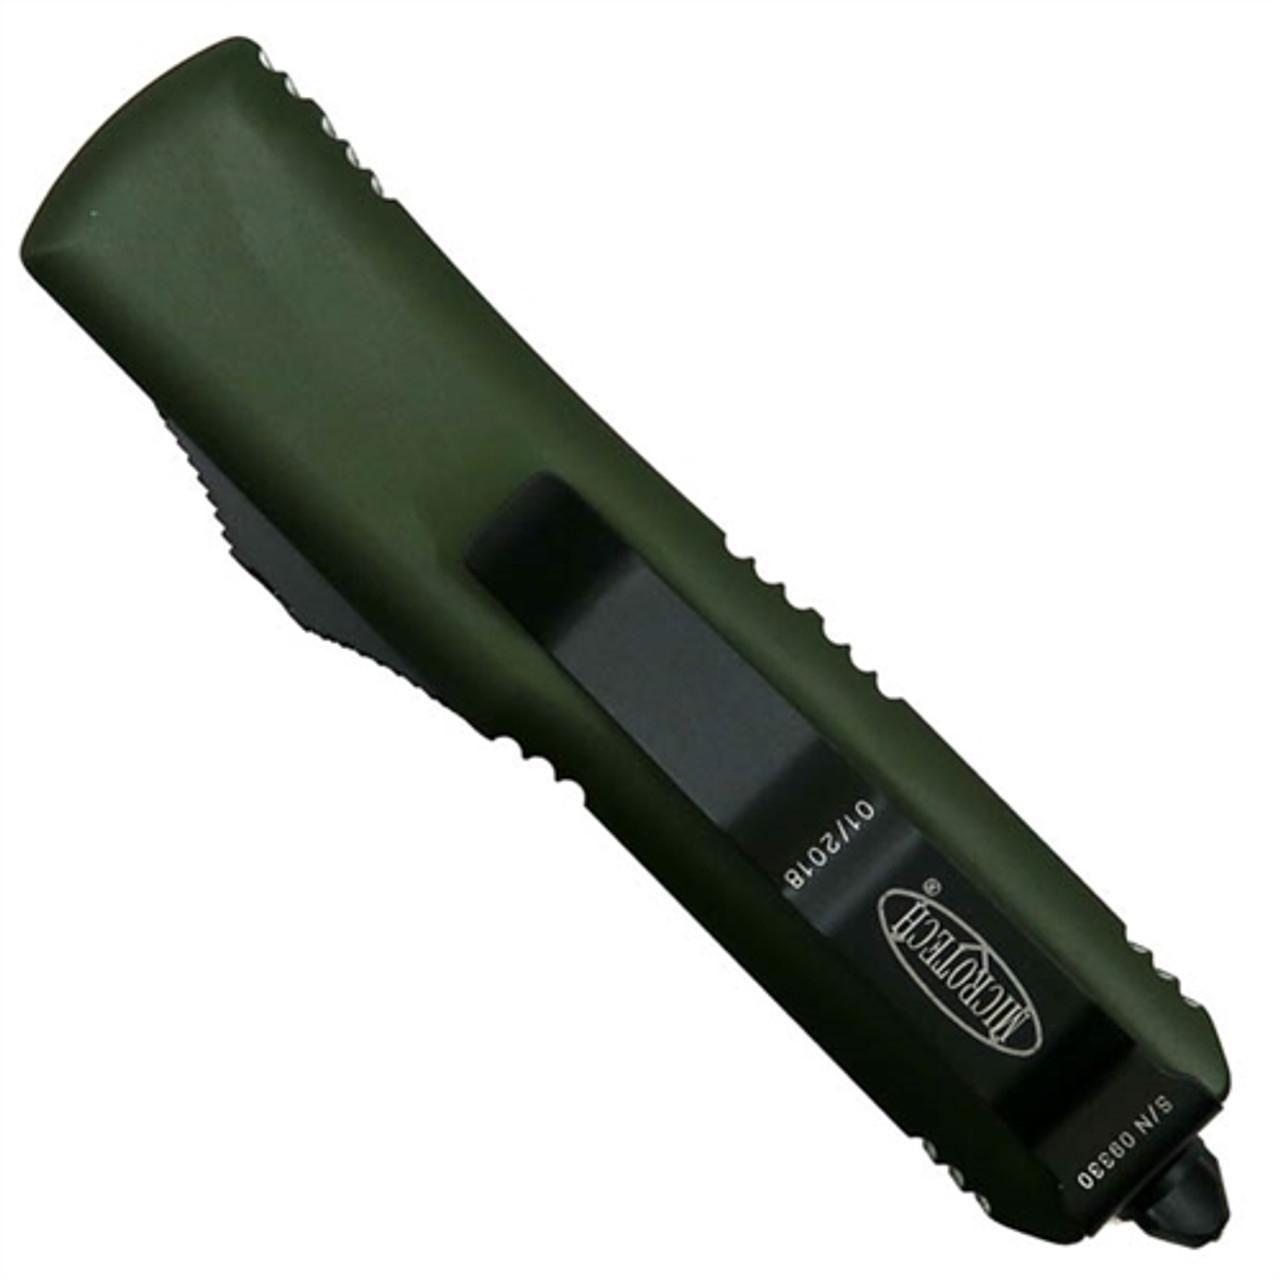 Microtech 233-1OD OD Green Contoured UTX-85 T/E OTF Auto Knife, Black Blade